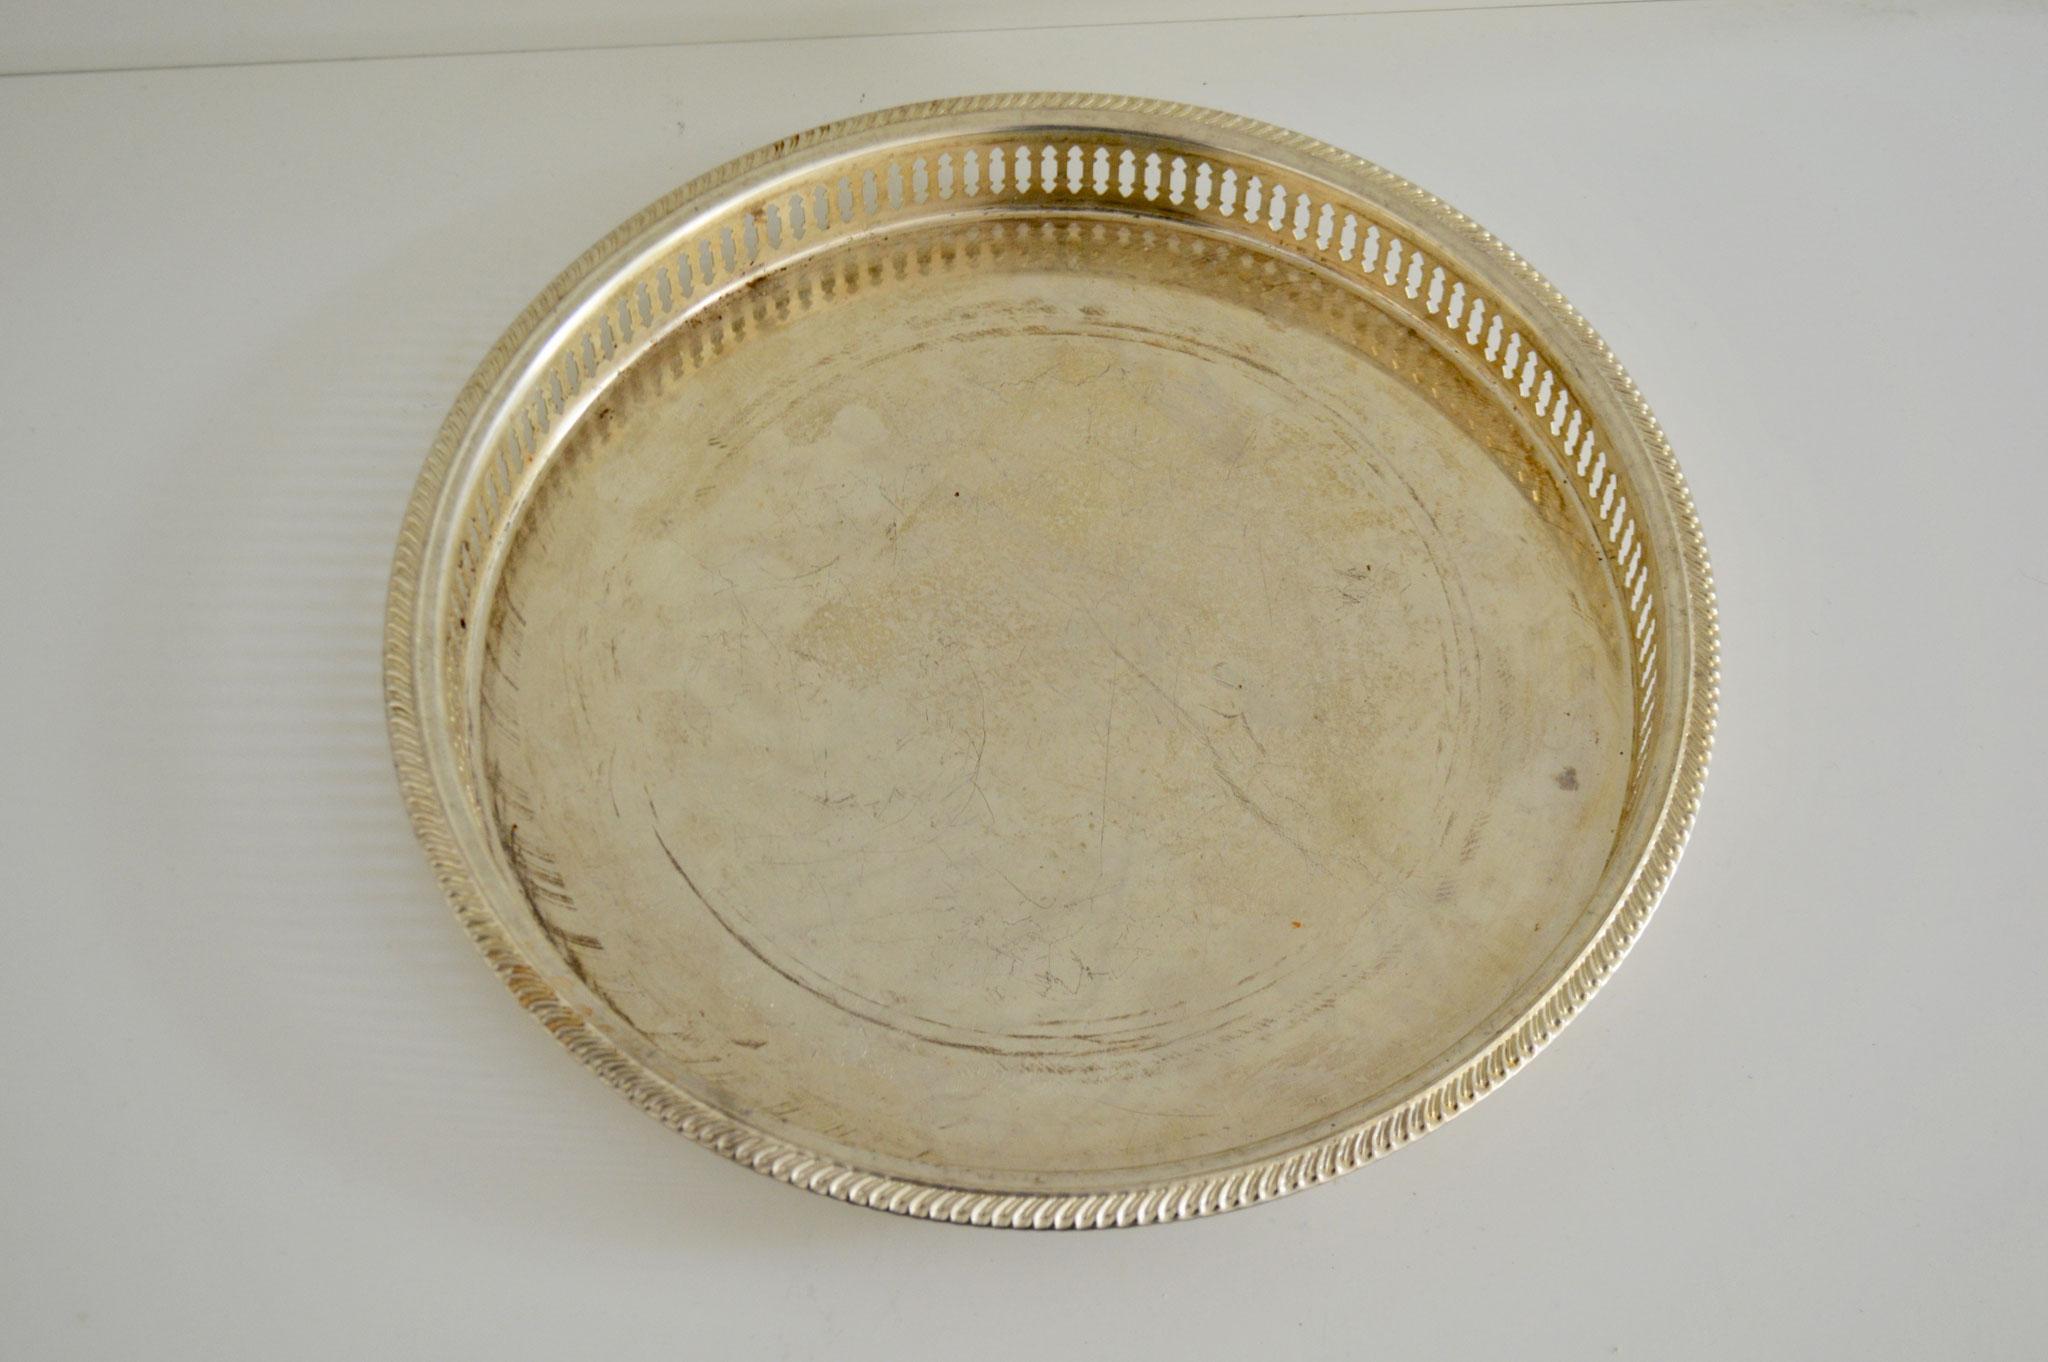 H) € 5, Durchmesser ca. 32 cm